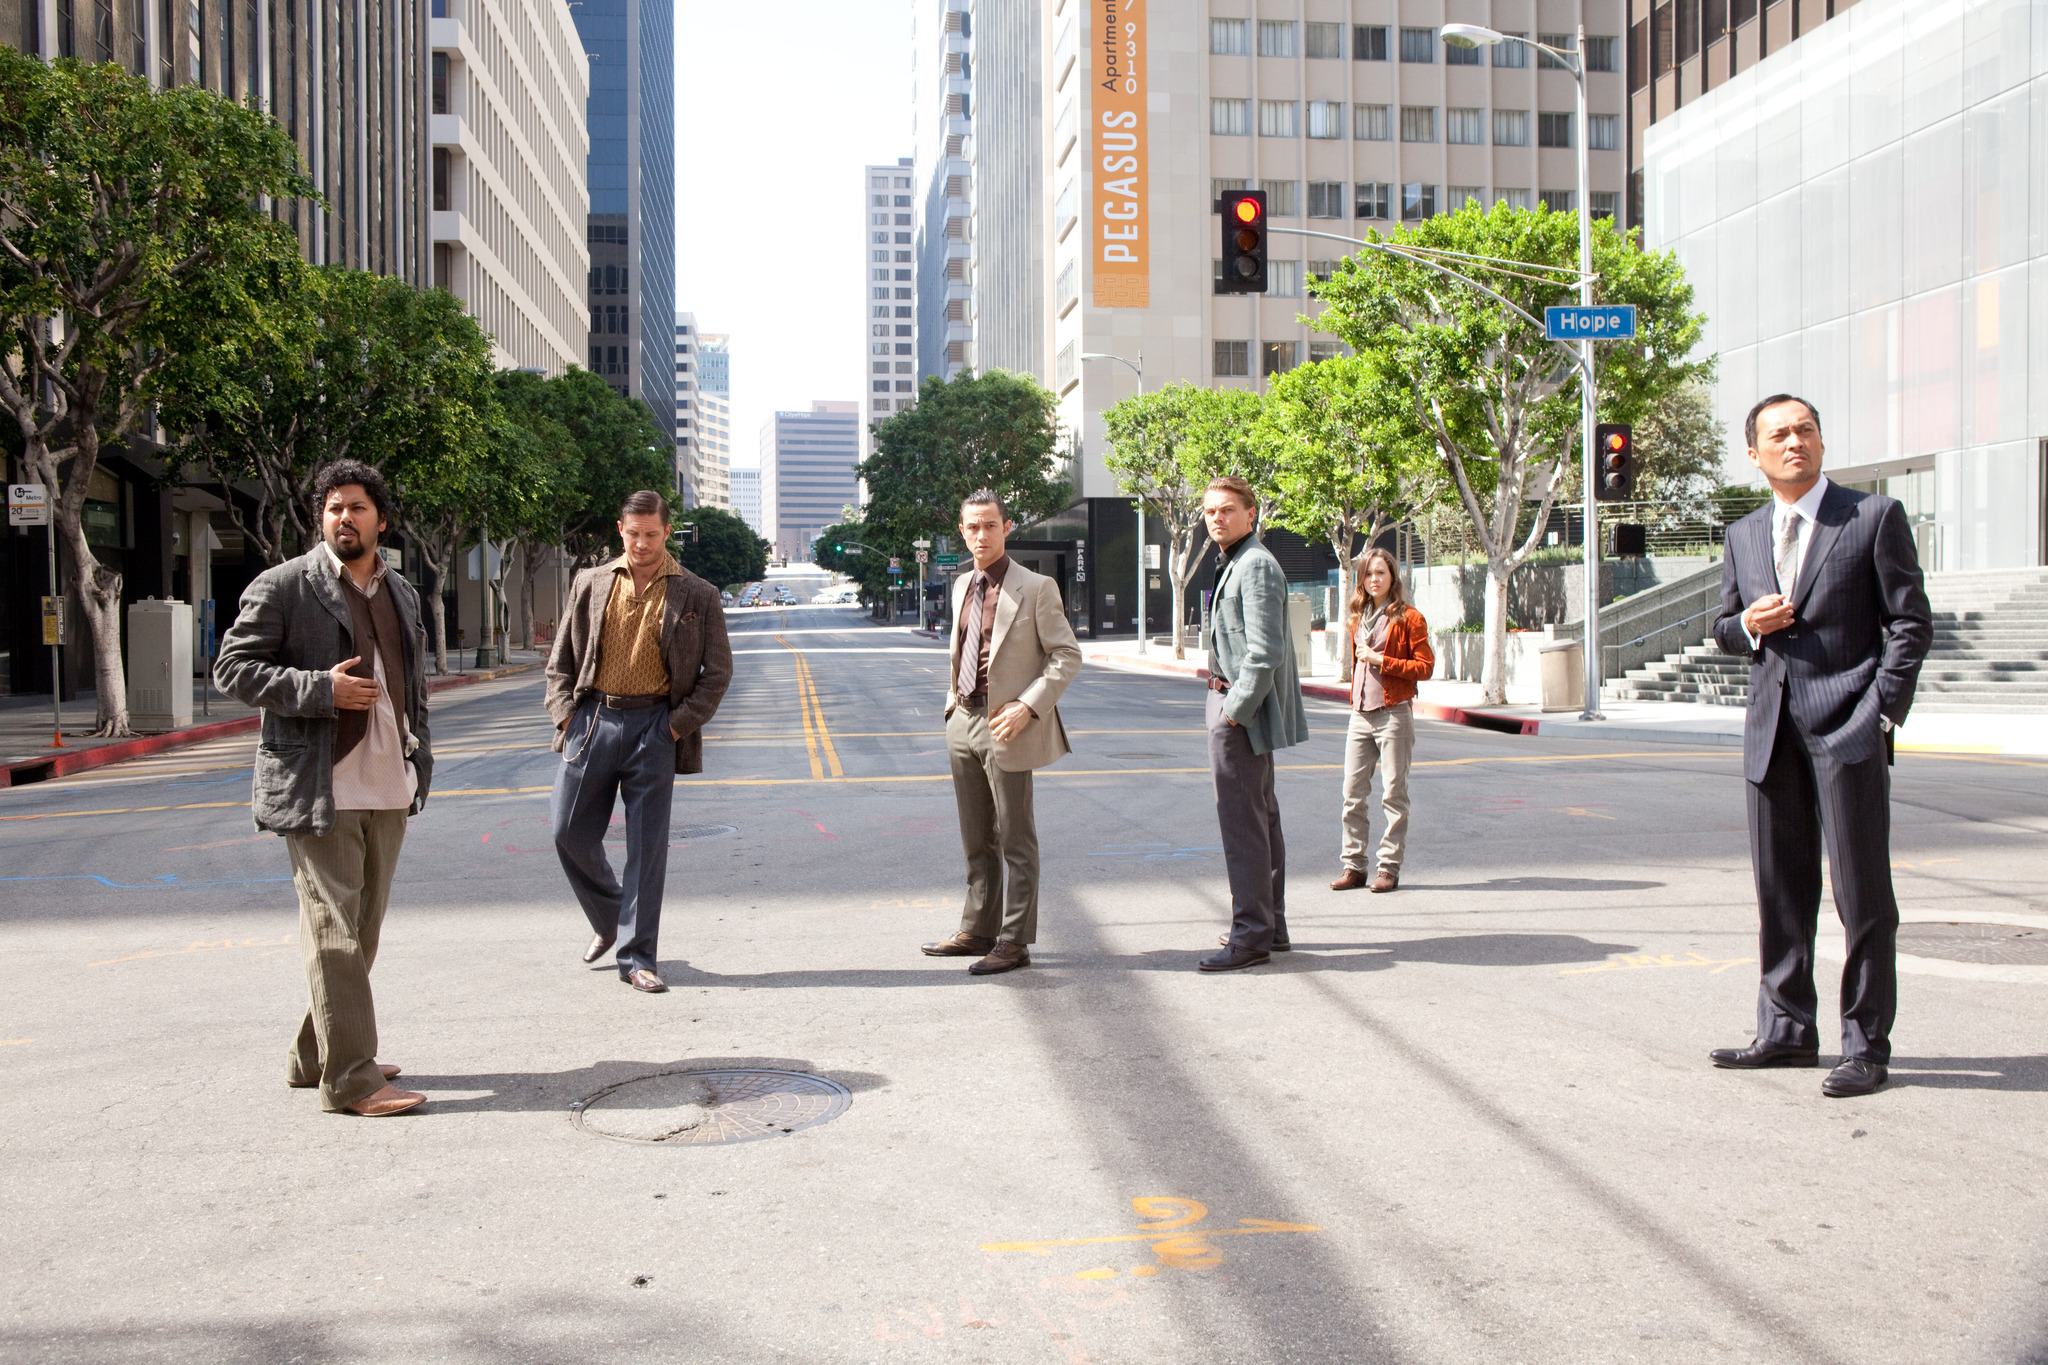 Leonardo DiCaprio, Joseph Gordon-Levitt, Tom Hardy, Elliot Page, Ken Watanabe, and Dileep Rao in Inception (2010)